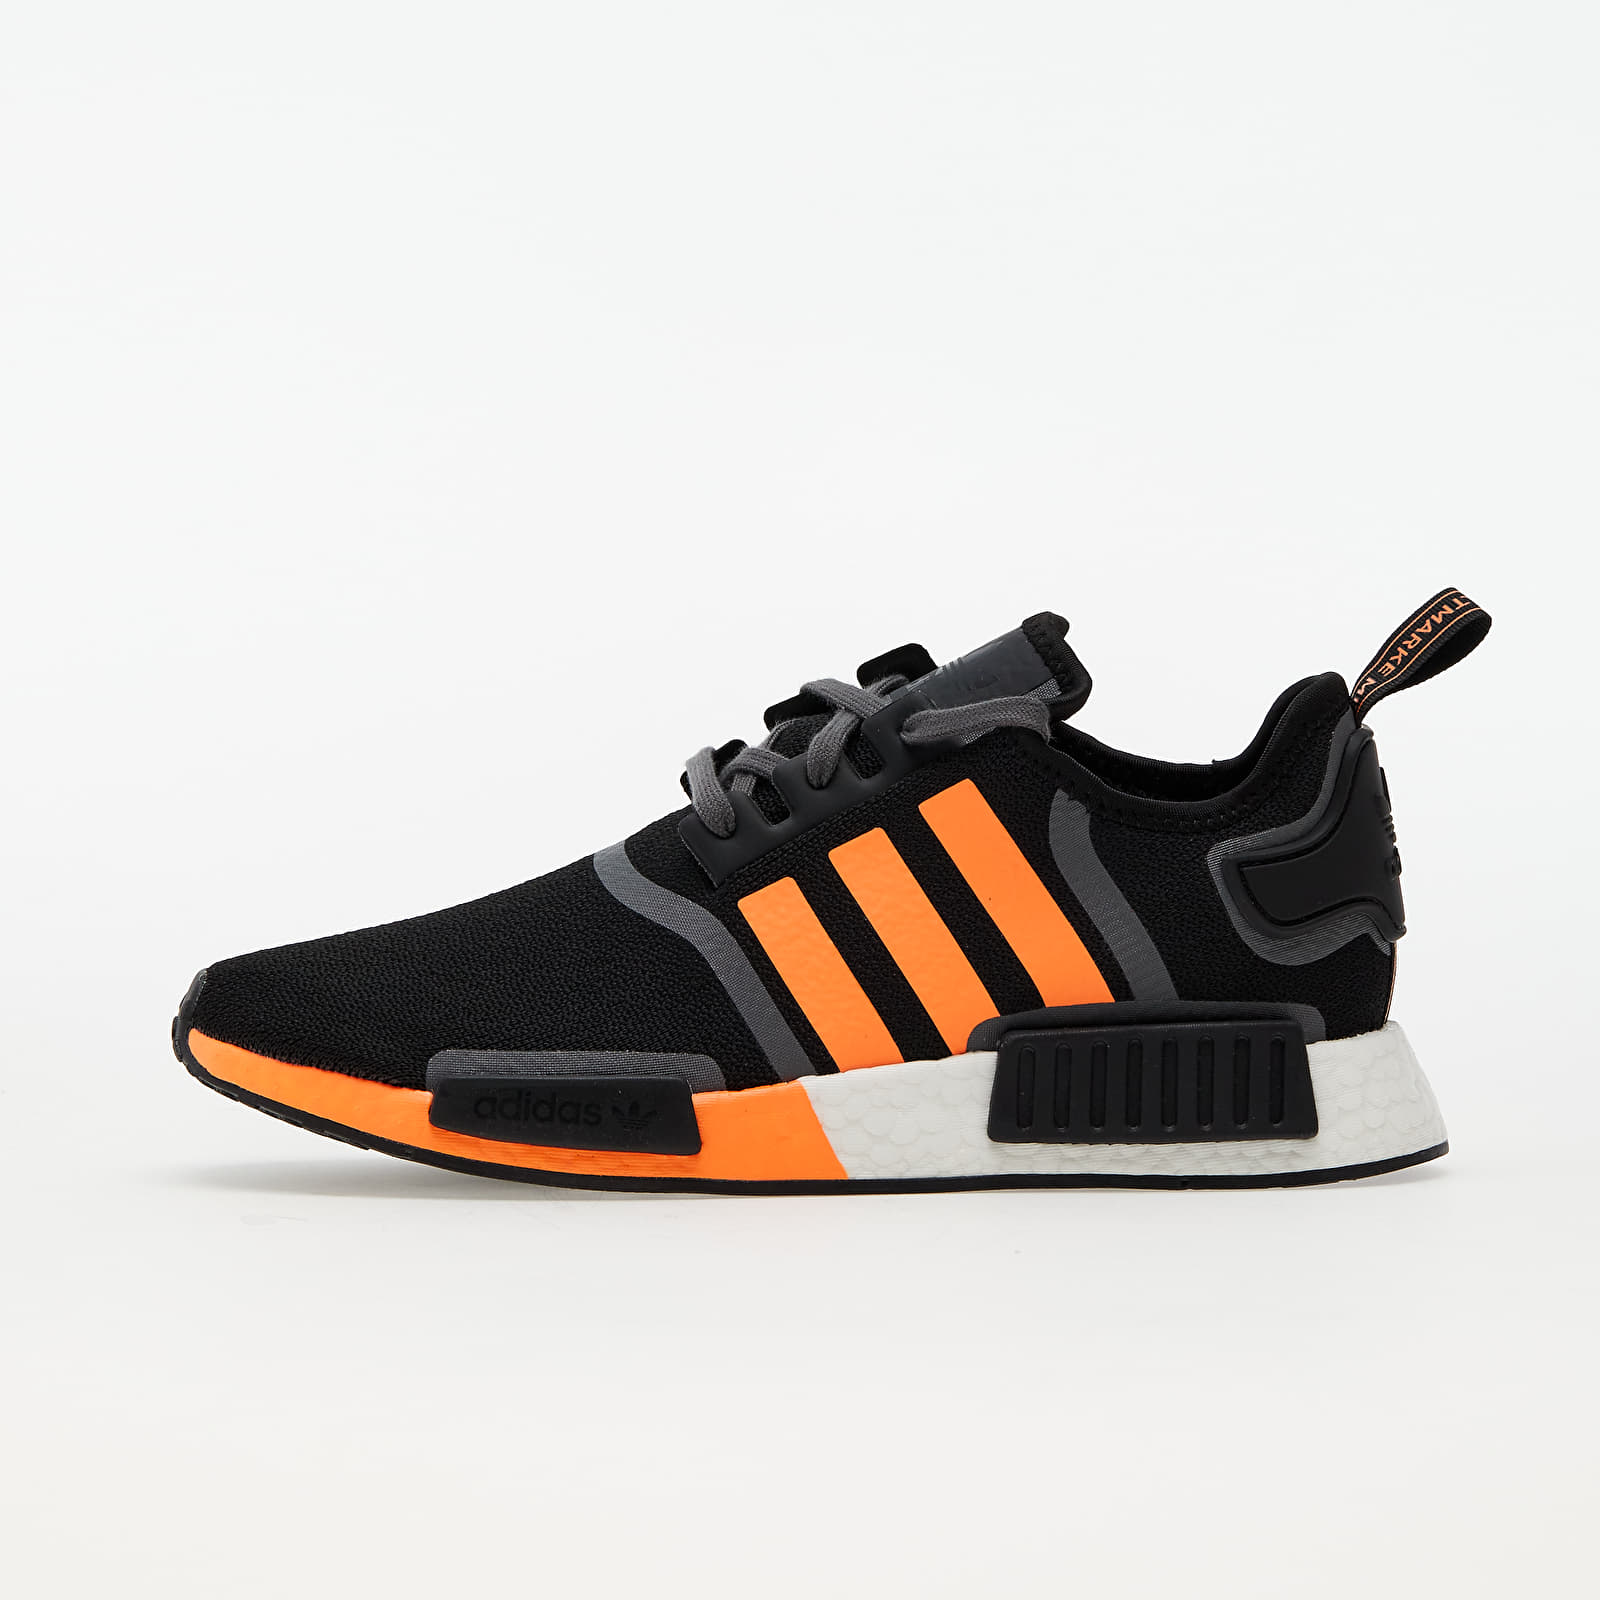 adidas NMD_R1 Core Black/ Screen Orange/ Grey Five G55575